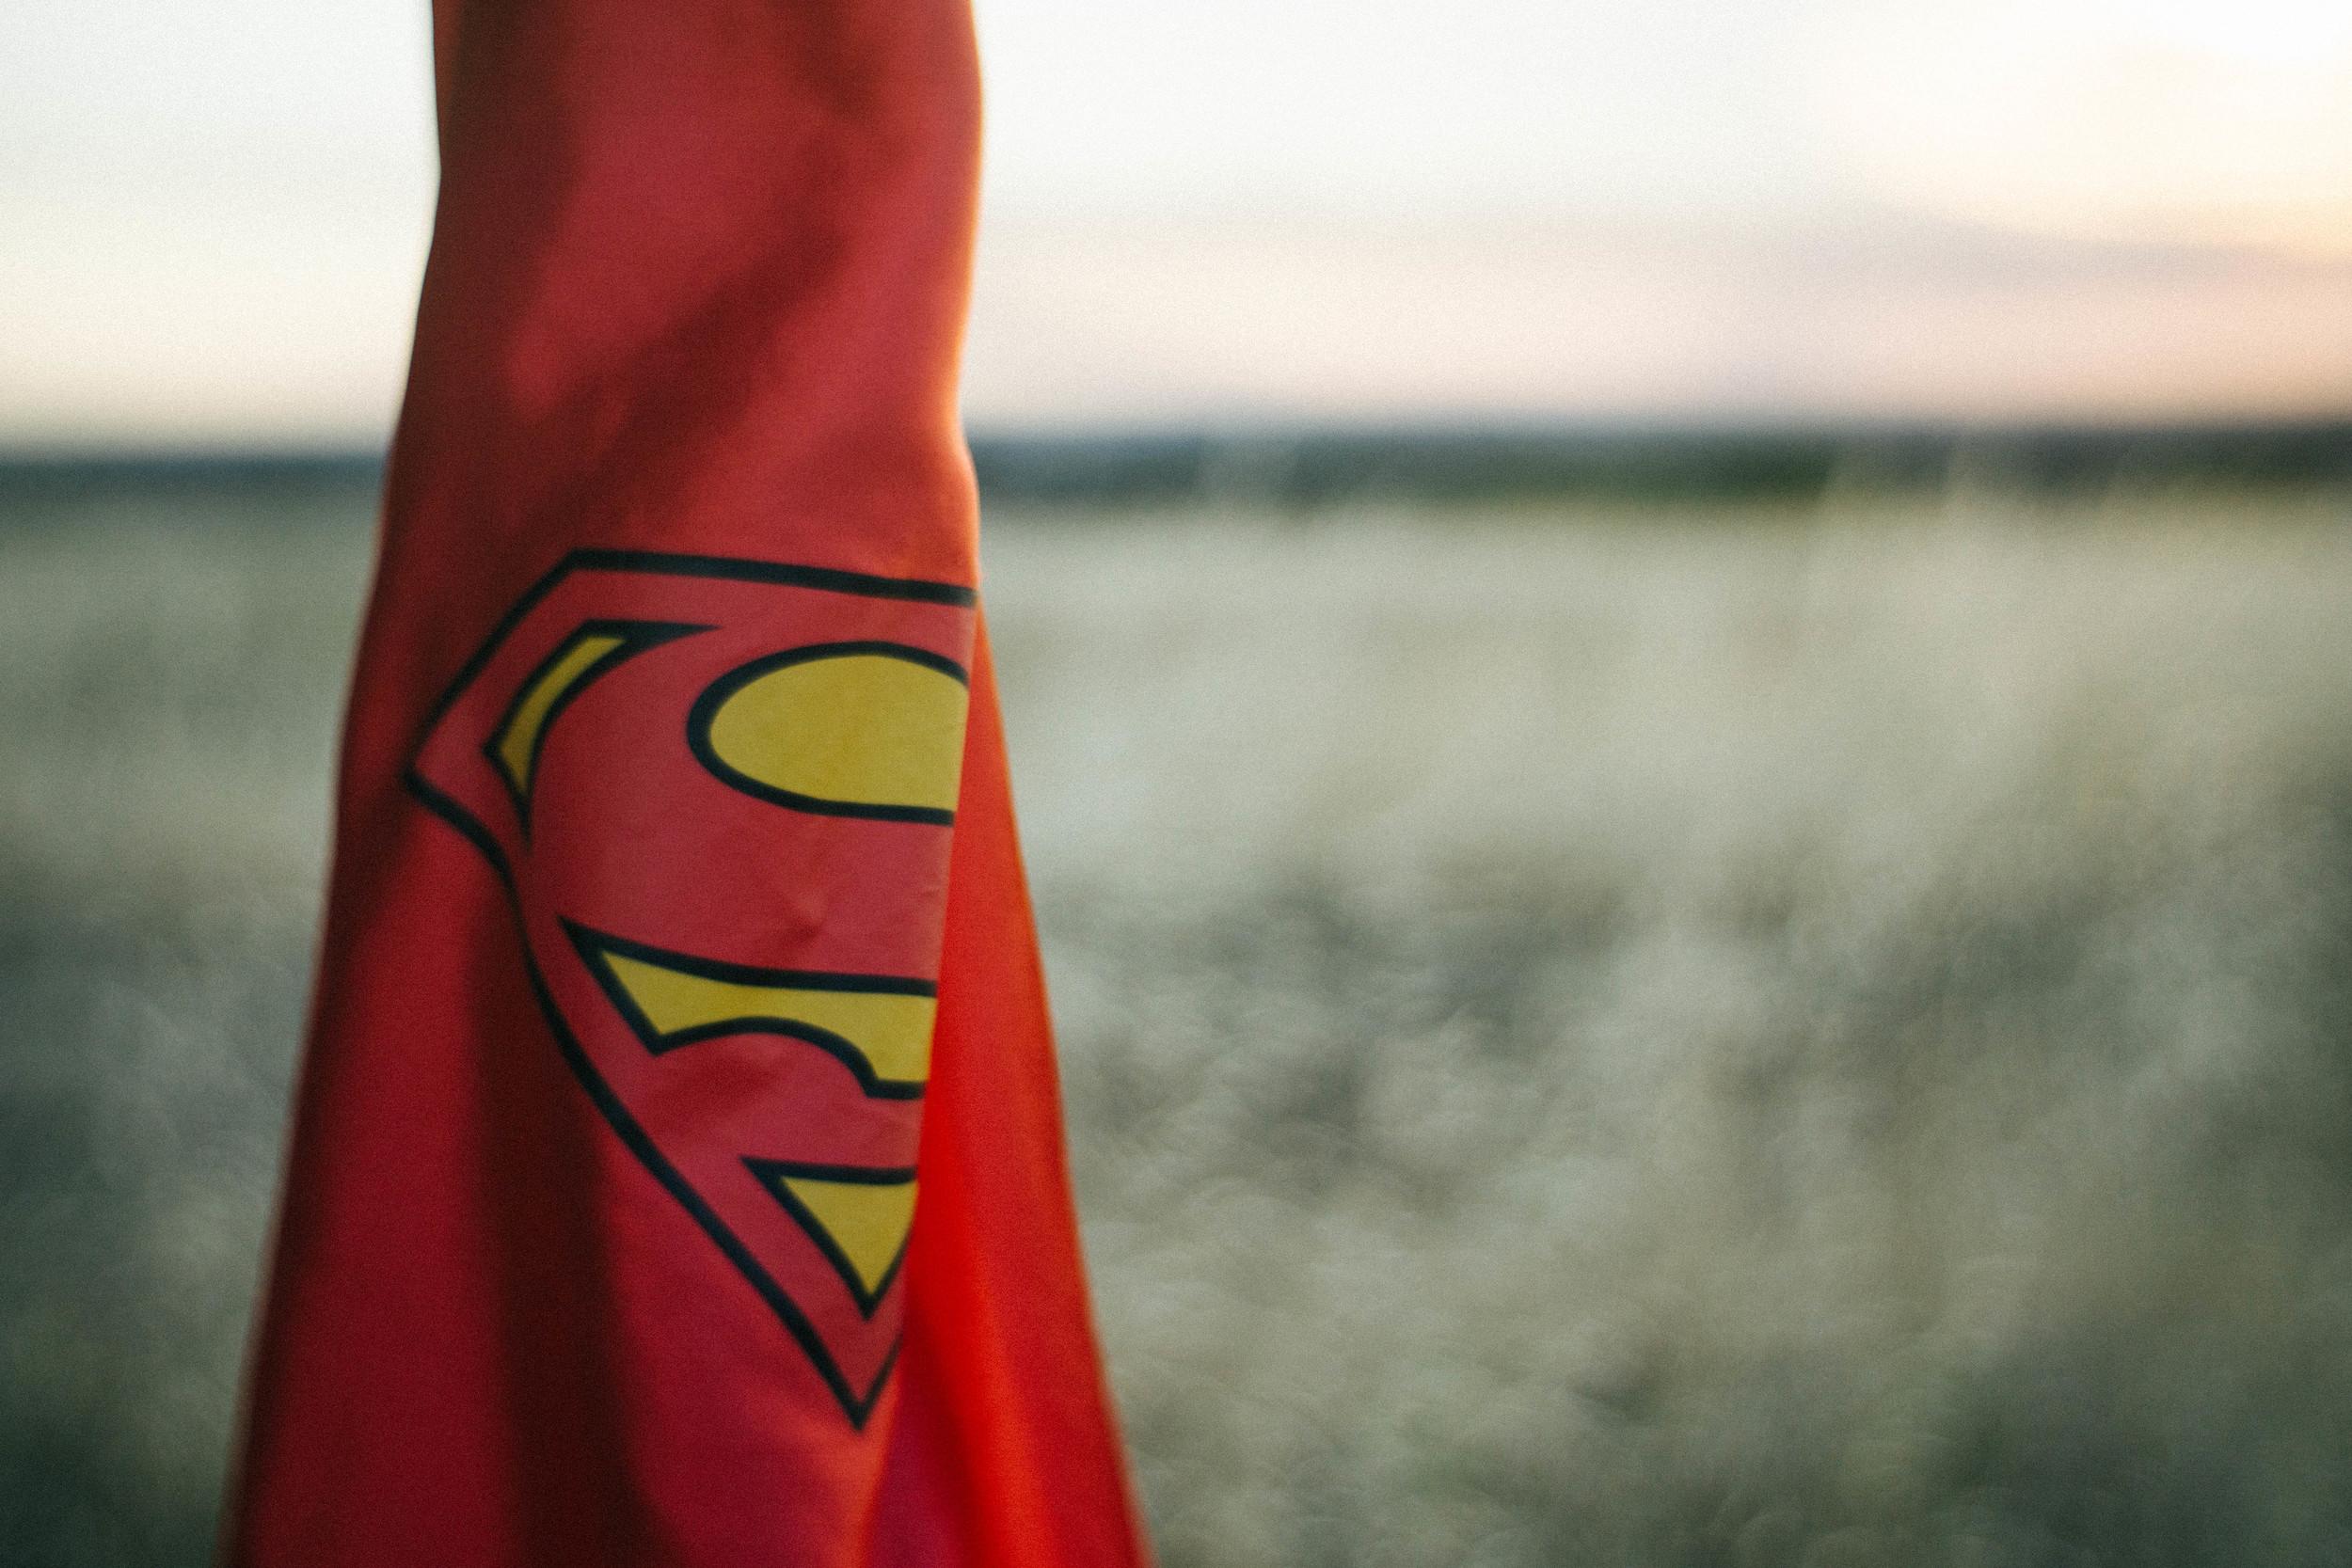 I'm no superhero, you guys. I just like wearing UnderRoos.